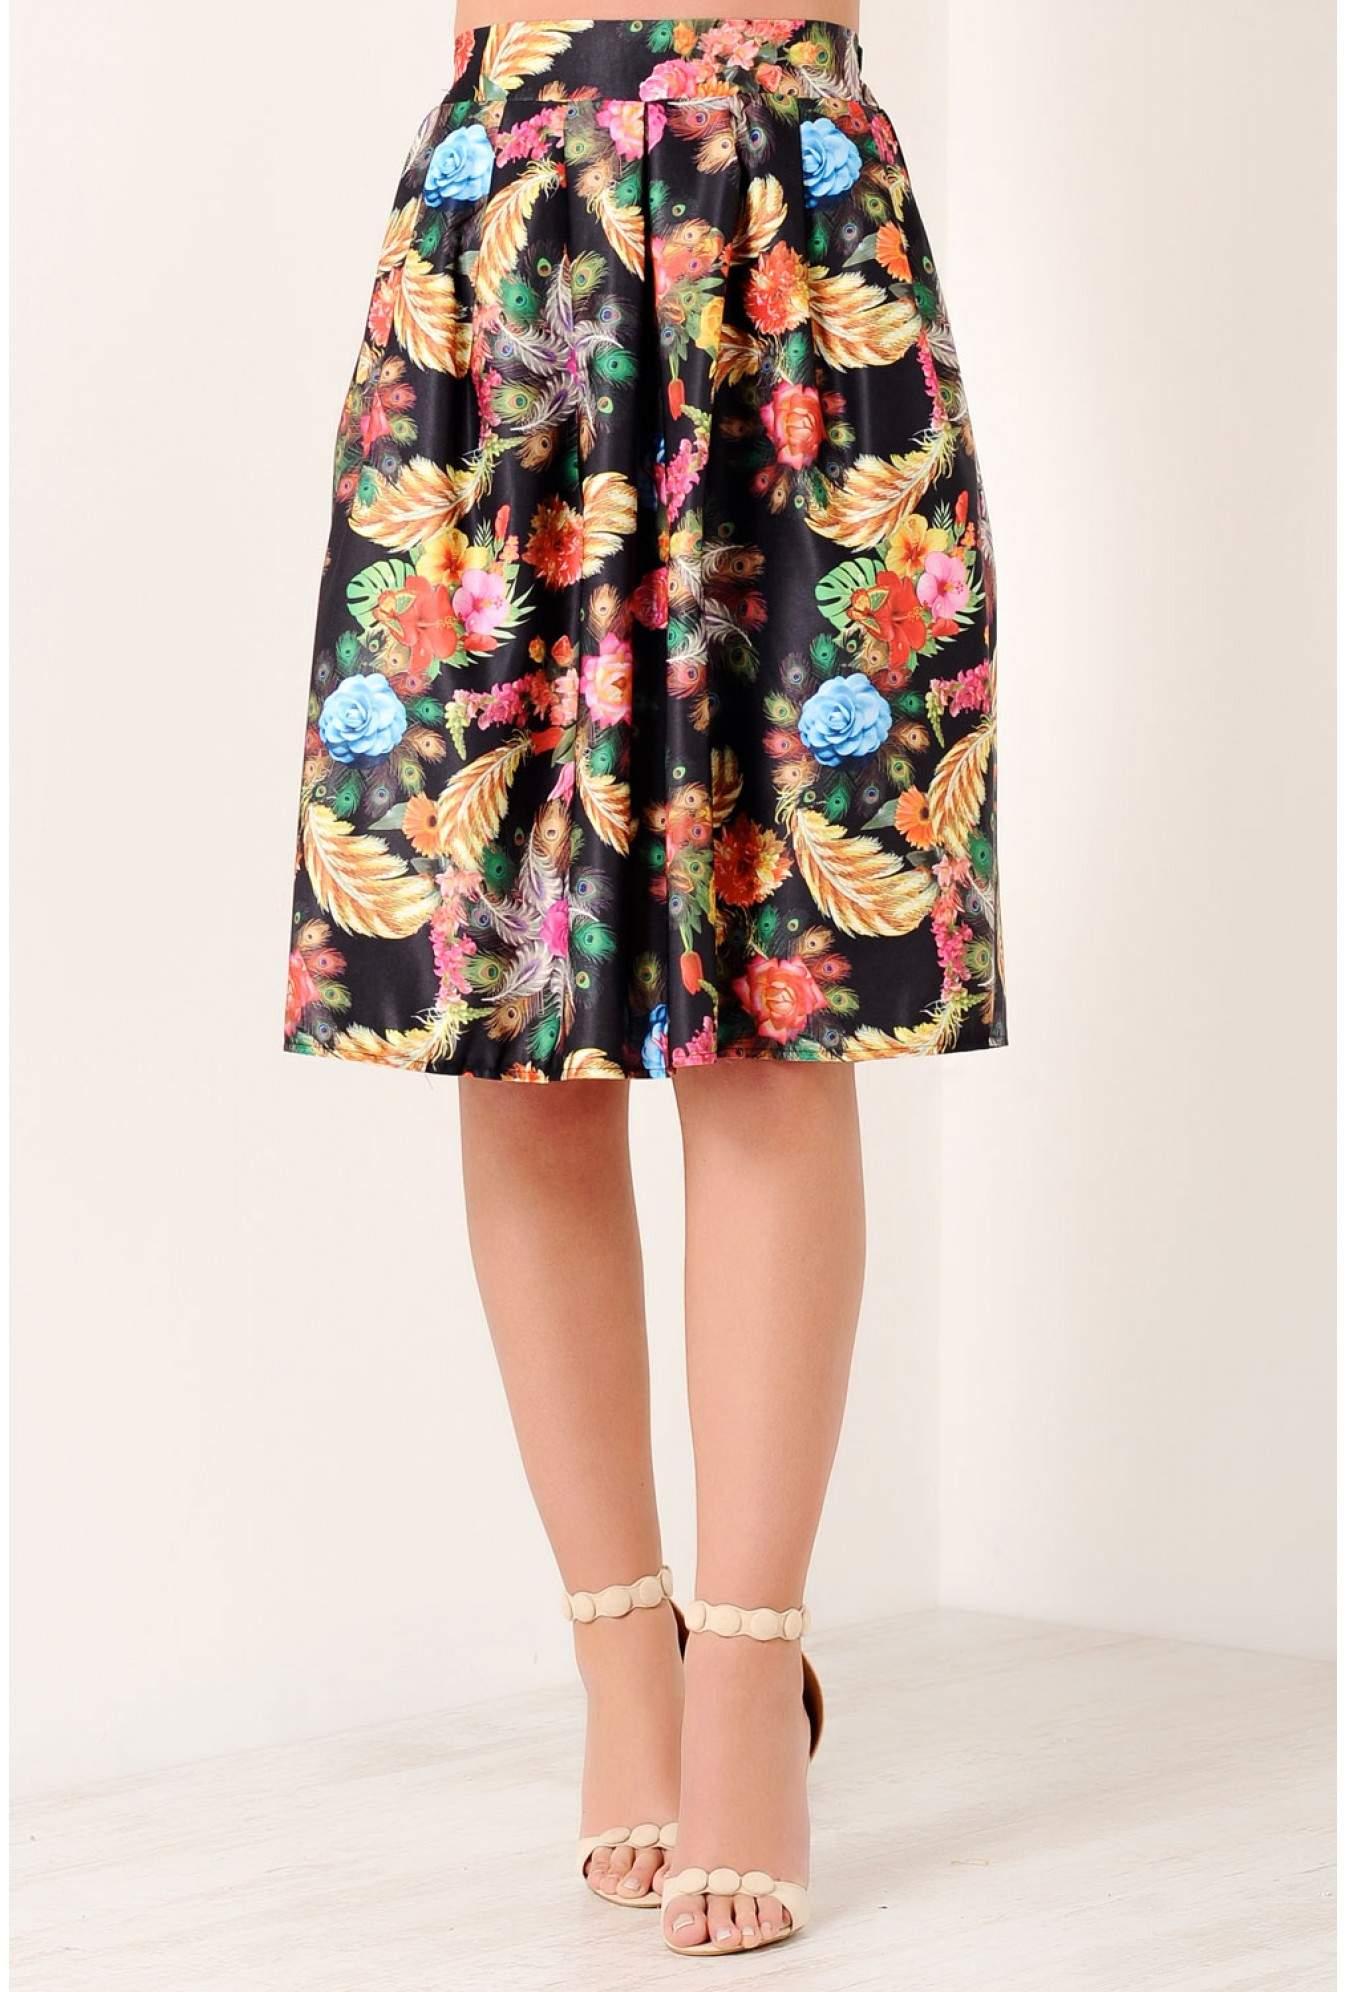 a3a74889bd1 Shikha Talia Peacock Feather Print Skirt in Multi Black